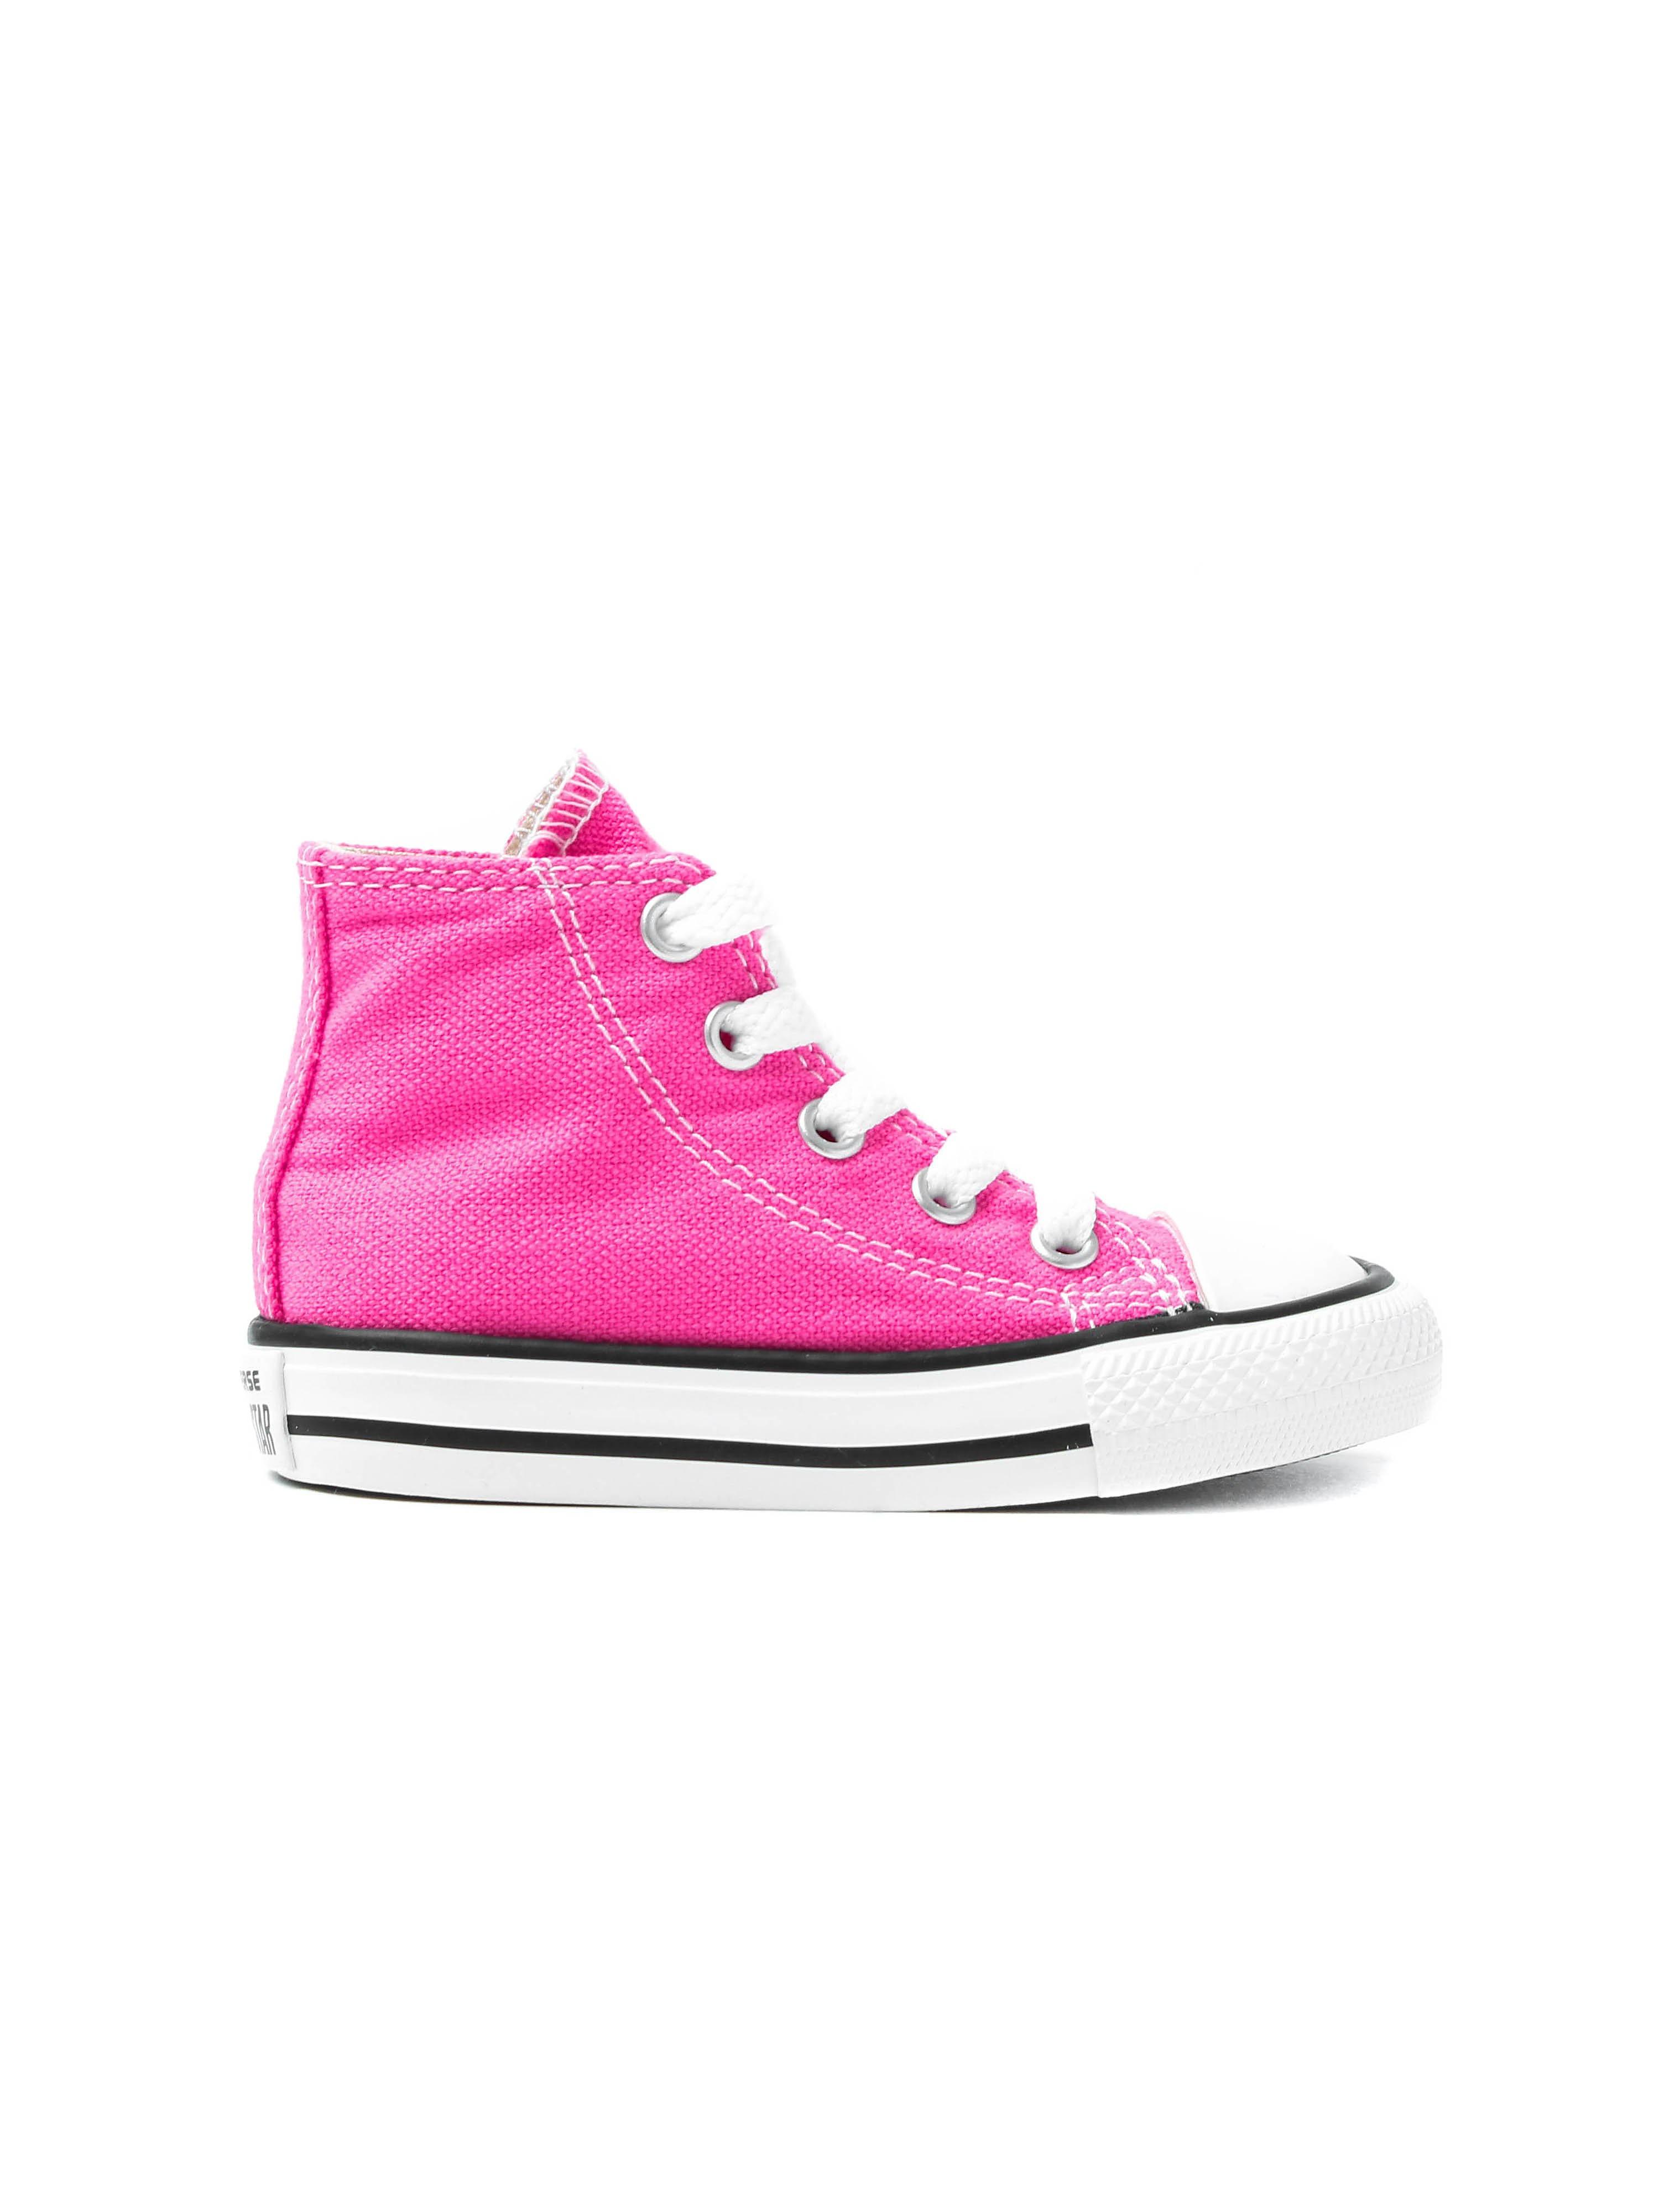 Converse Chuck Taylor All Star Hi Pink Pow – Kids